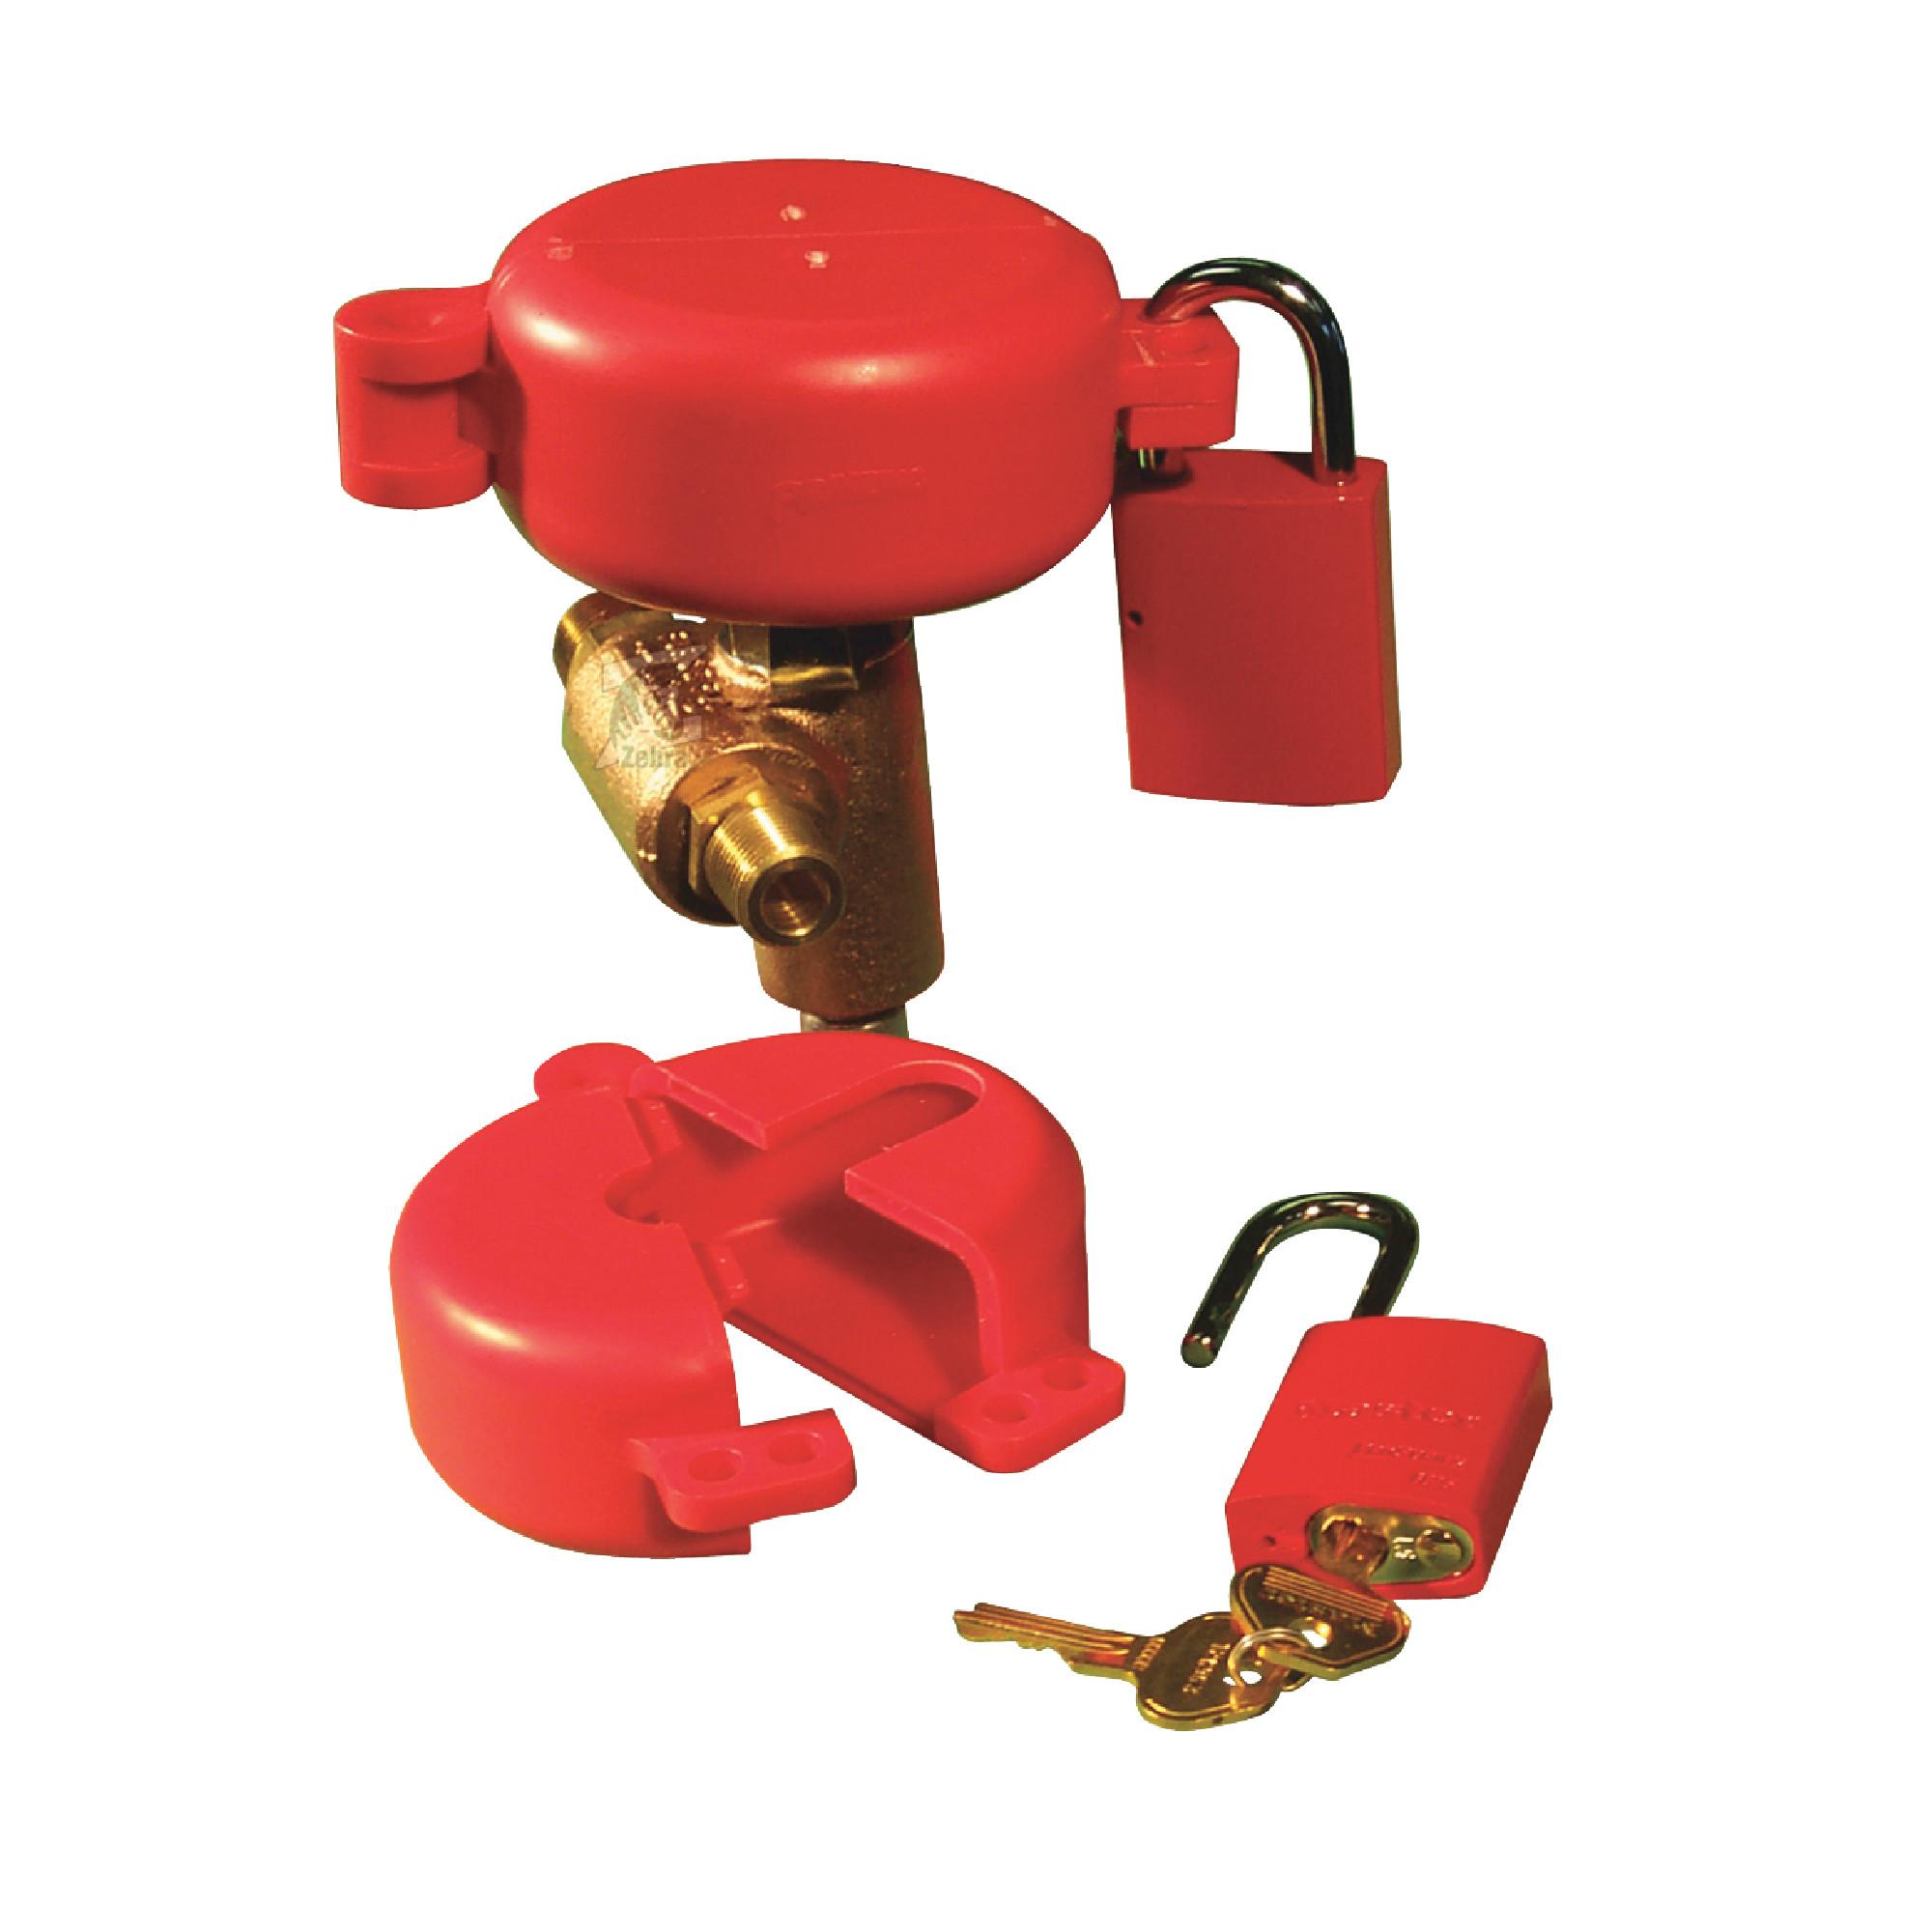 Lockout for Venturi Coolant Mixers